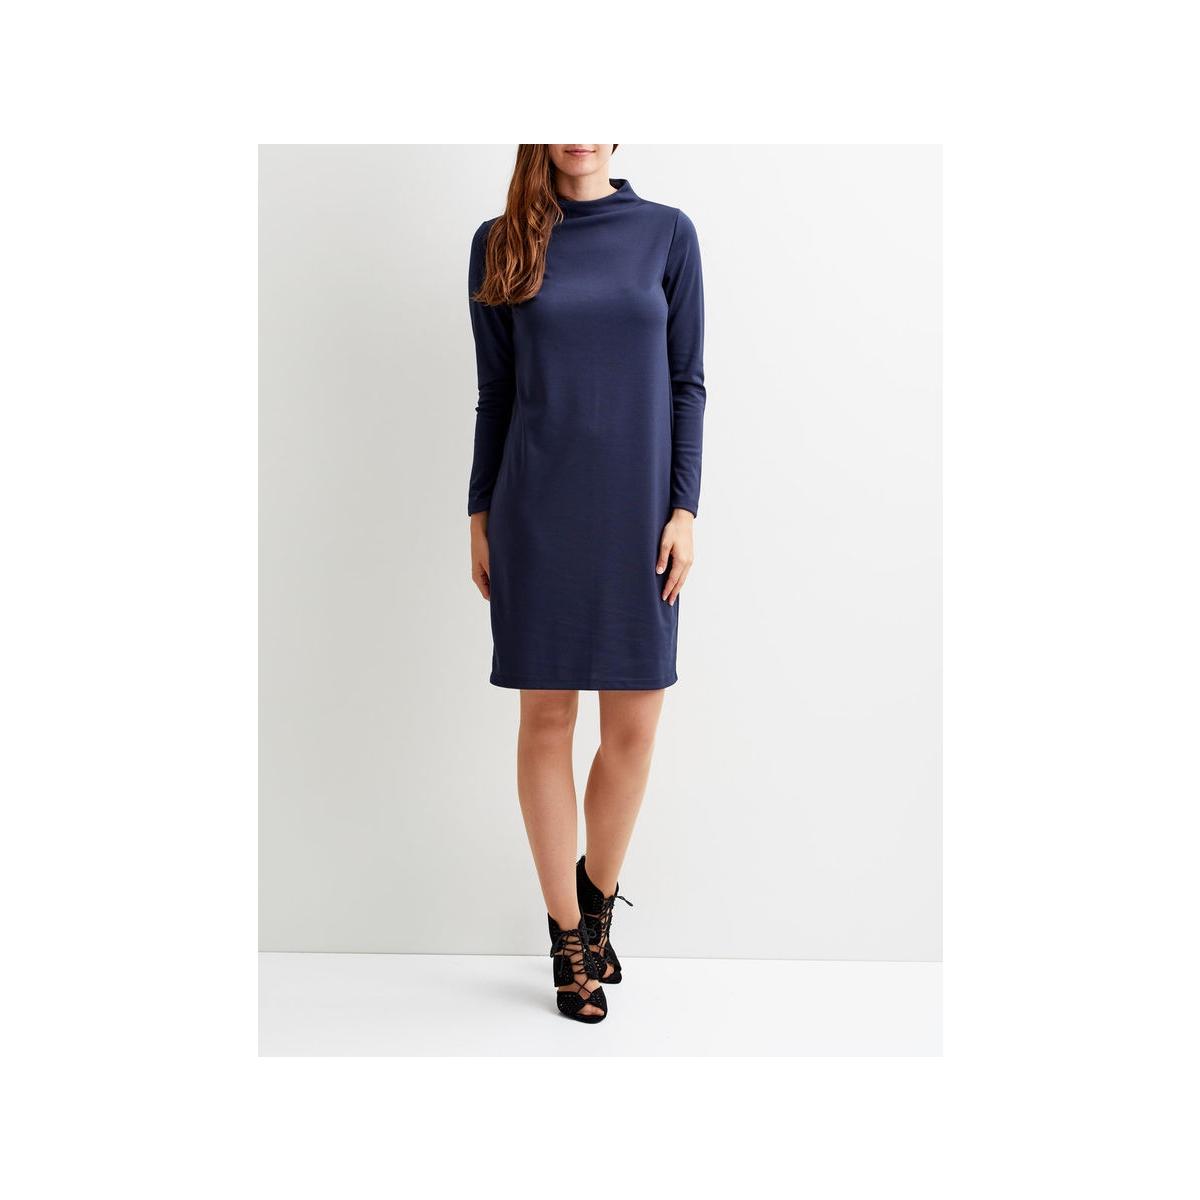 vifaunas l/s high neck dress-fav 14043490 vila jurk total eclipse